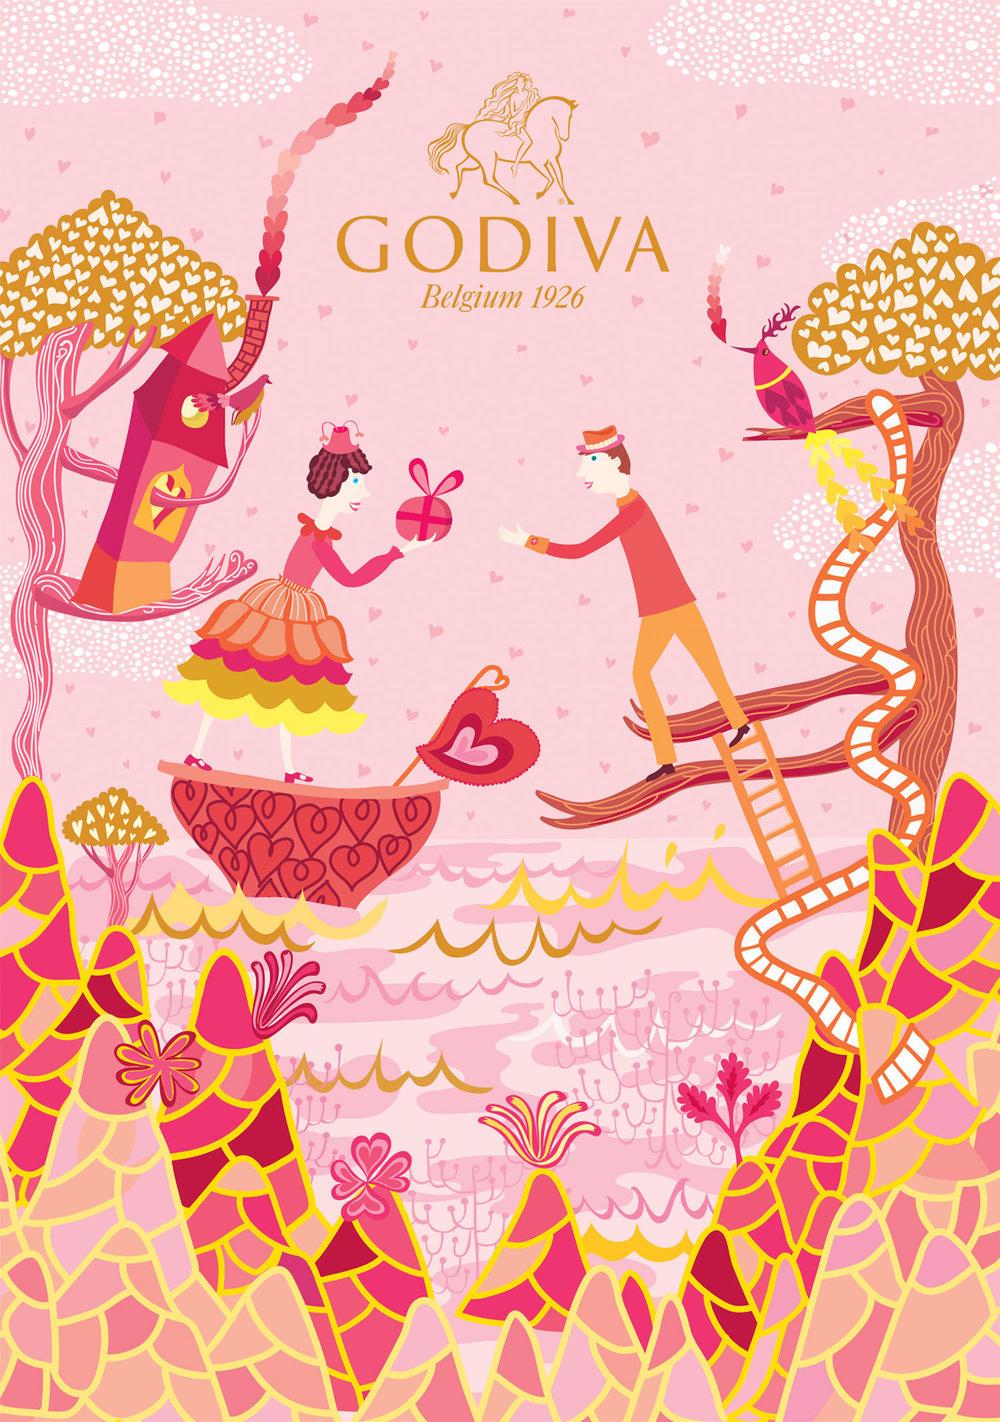 Godiva Valentine's Day 2017